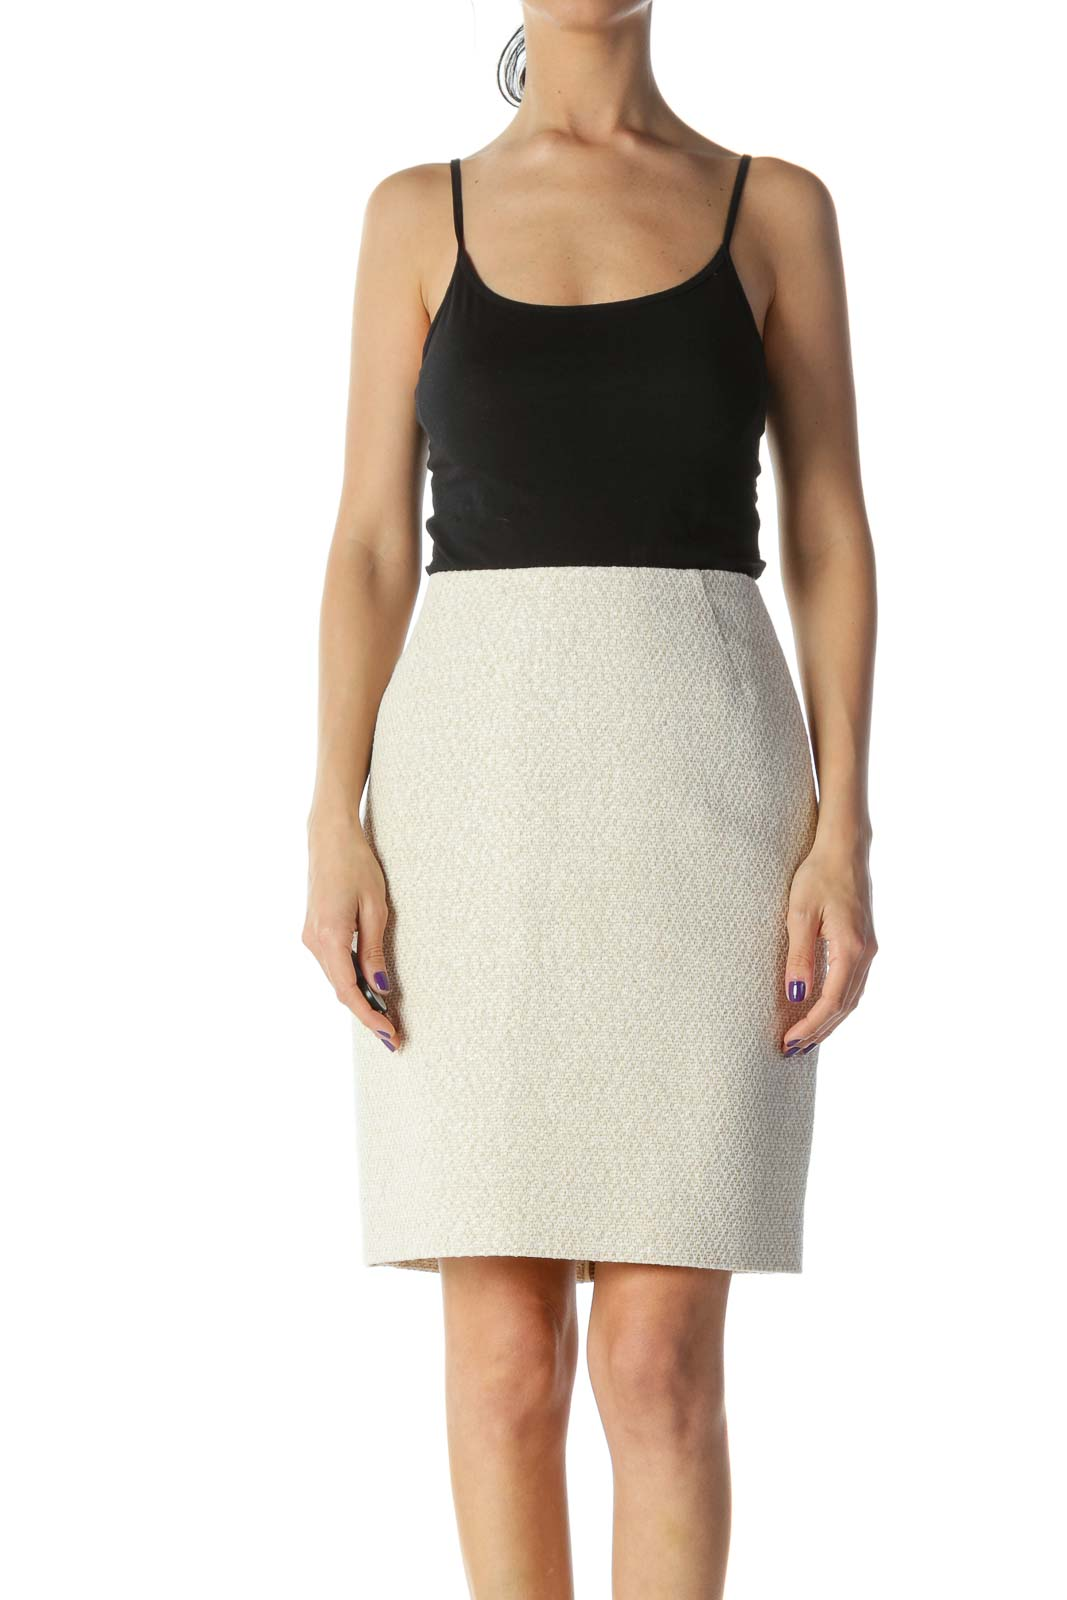 Beige Knit Double Zipper Pencil Skirt Front